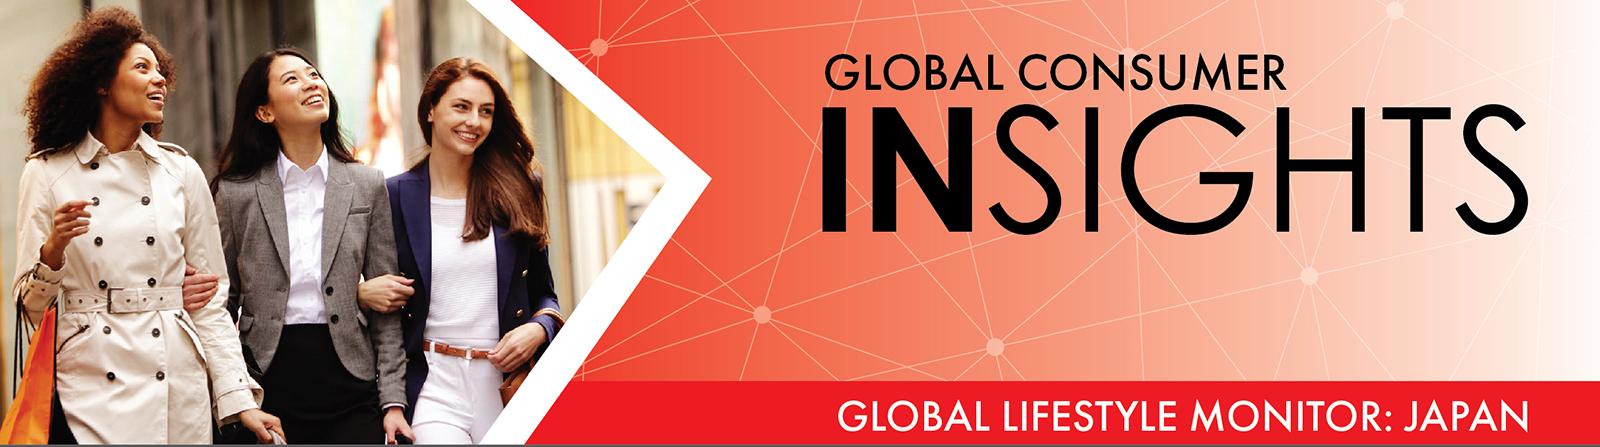 Global Lifestyle Monitor: Japan